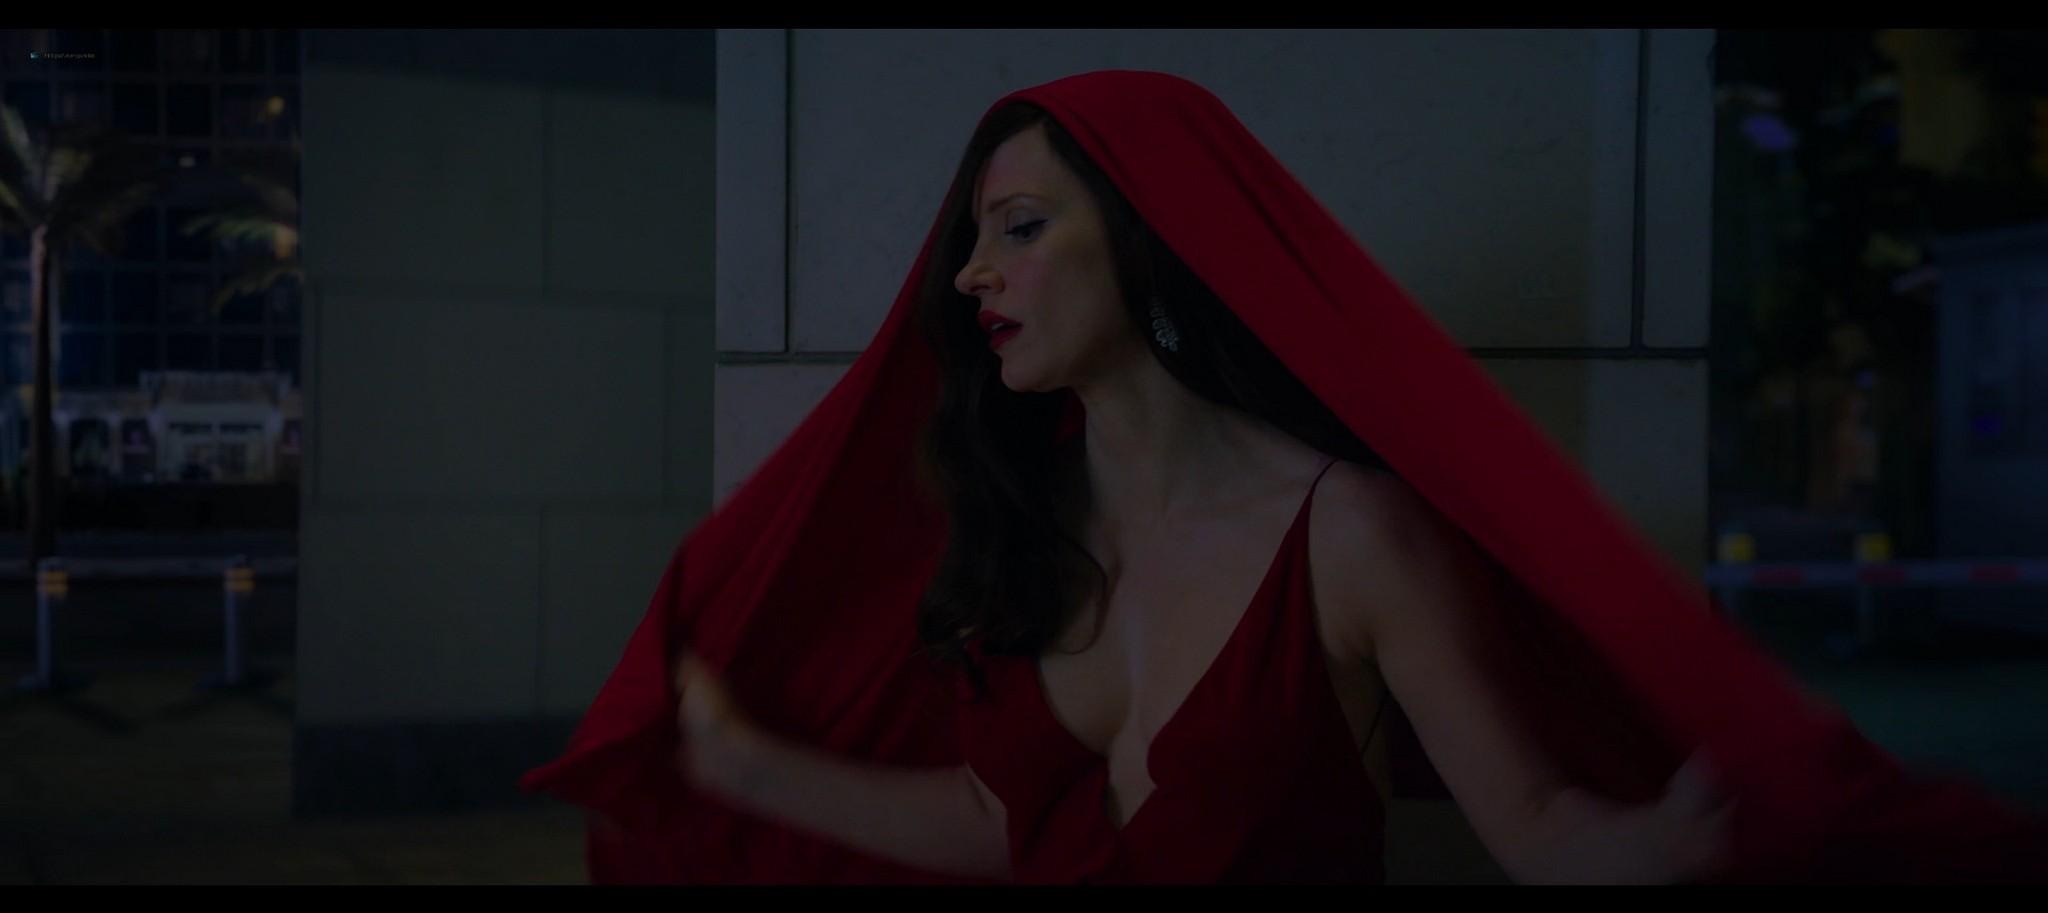 Jessica Chastain hot Jess Weixler sexy Ava 2020 HD 1080p BluRay REMUX 014